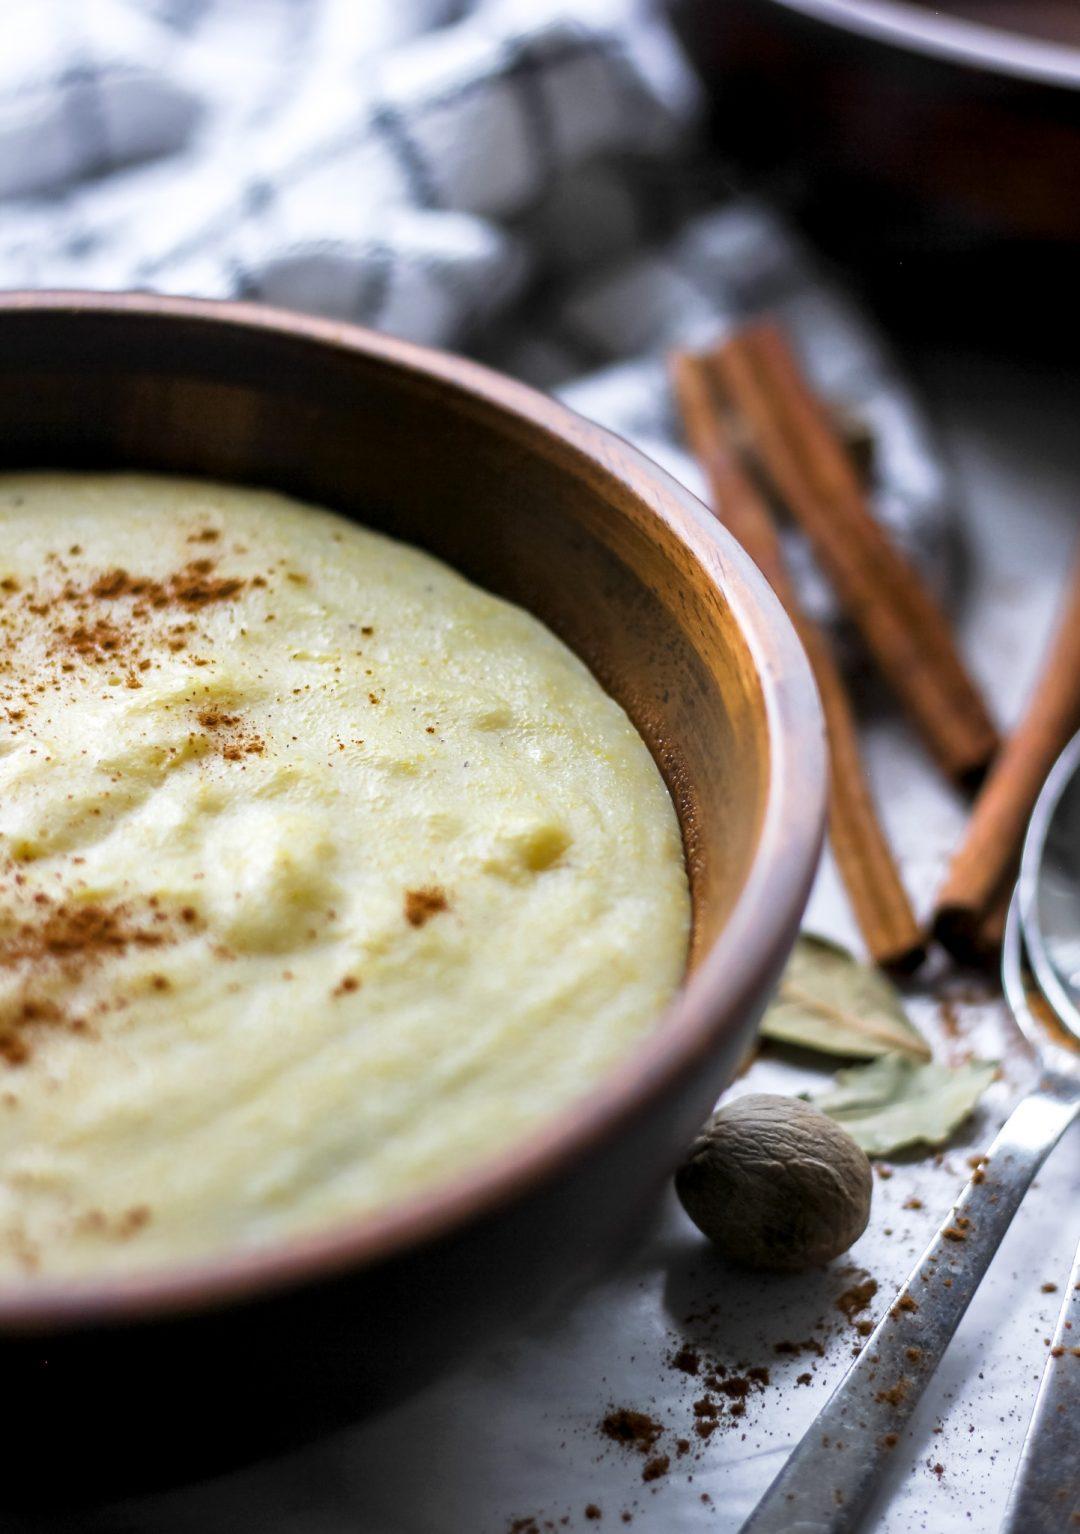 Jamaican Cornmeal Porridge in brown wooden bowl with spoons